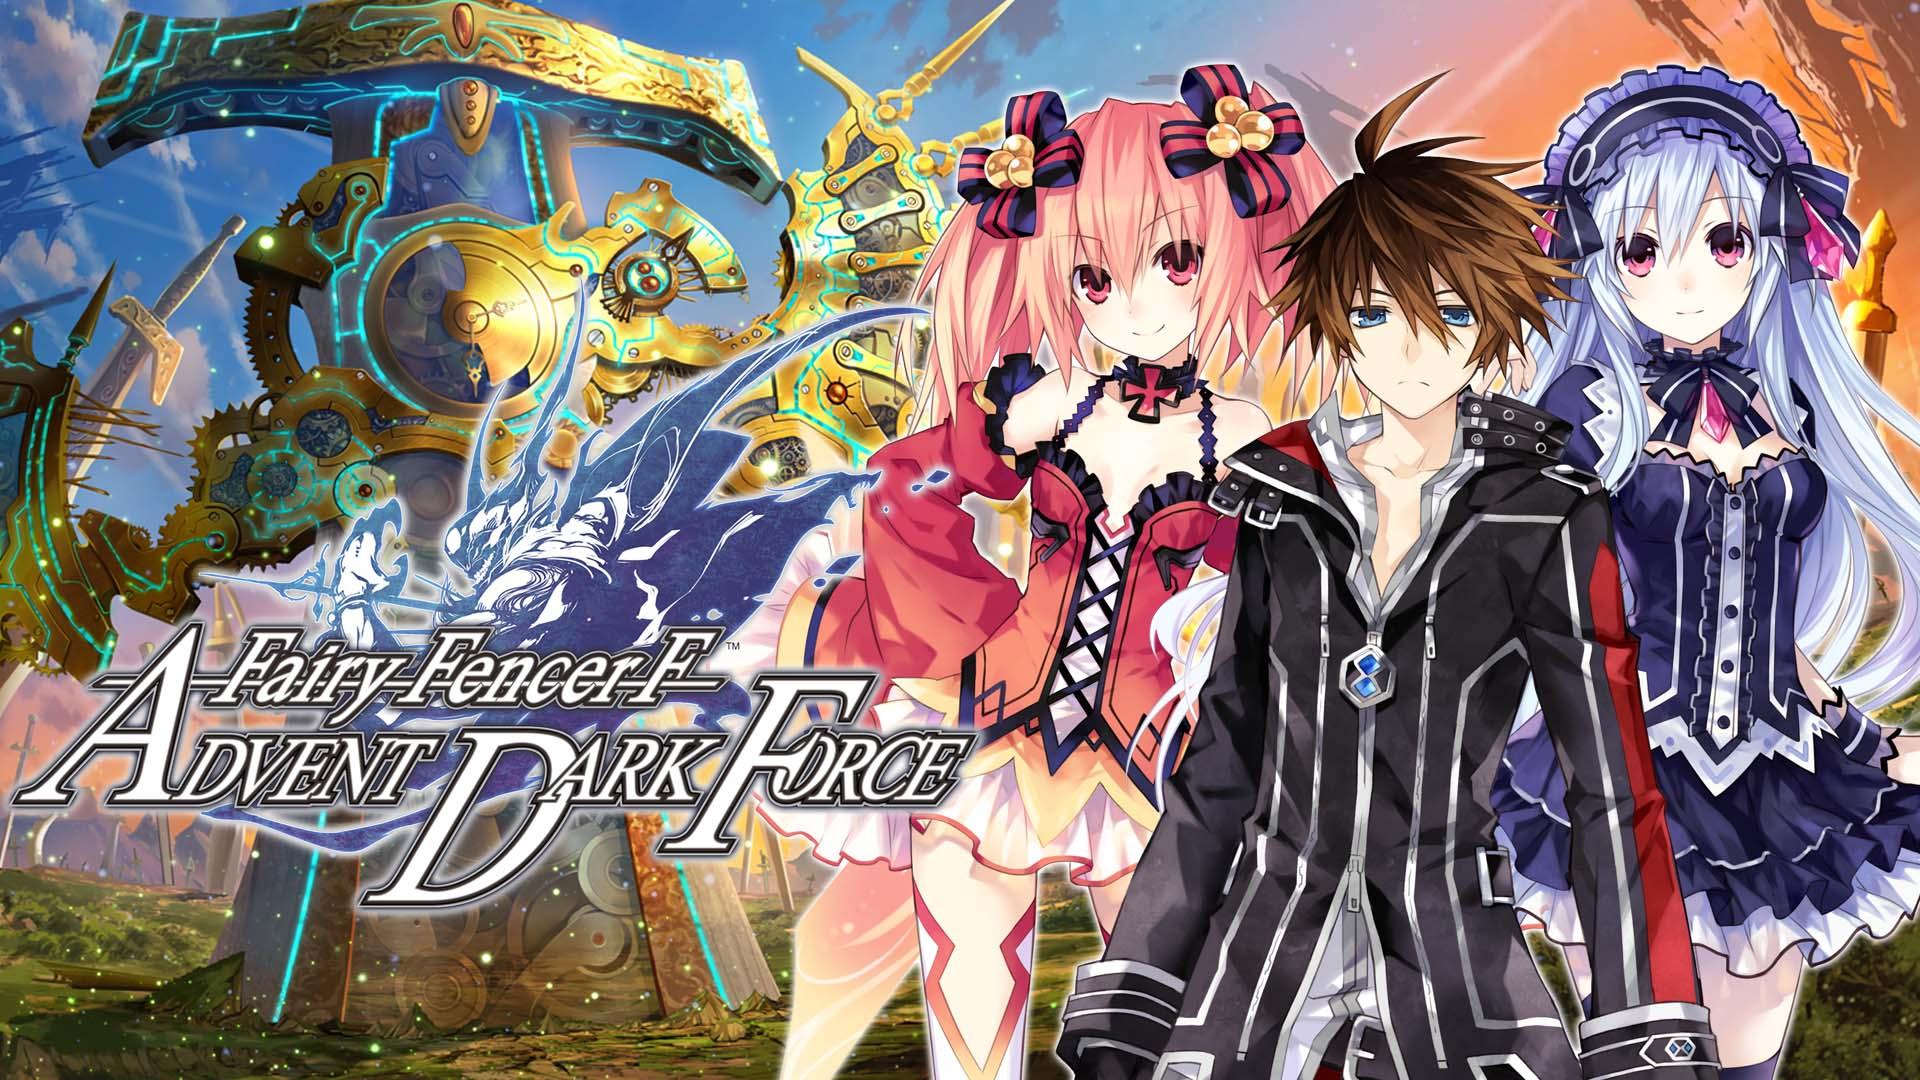 Fairy Fencer F Advent Dark Force Nintendo Switch Eshop Download